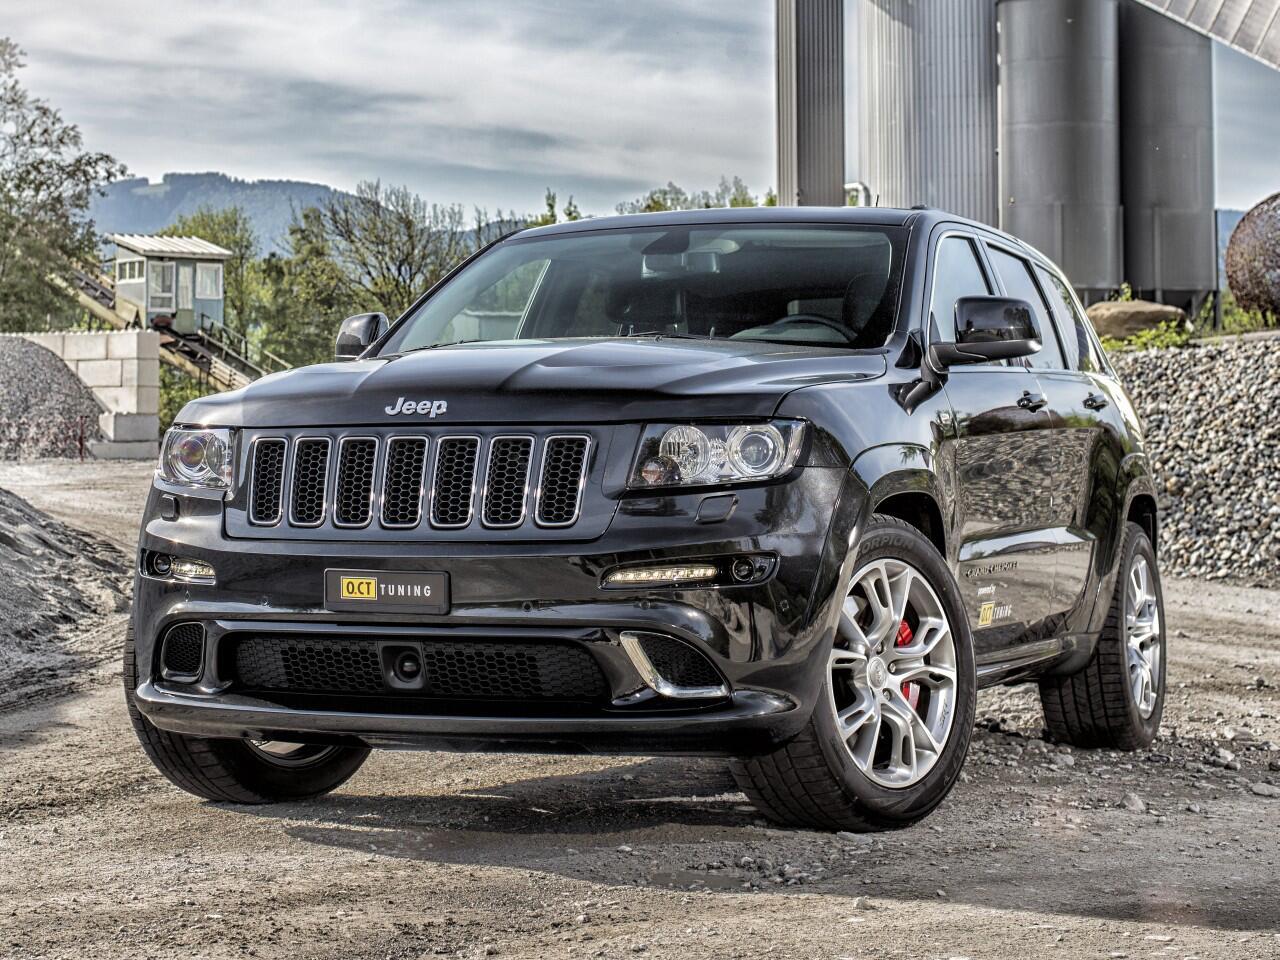 Bild zu Jeep Grand Cherokee SRT8